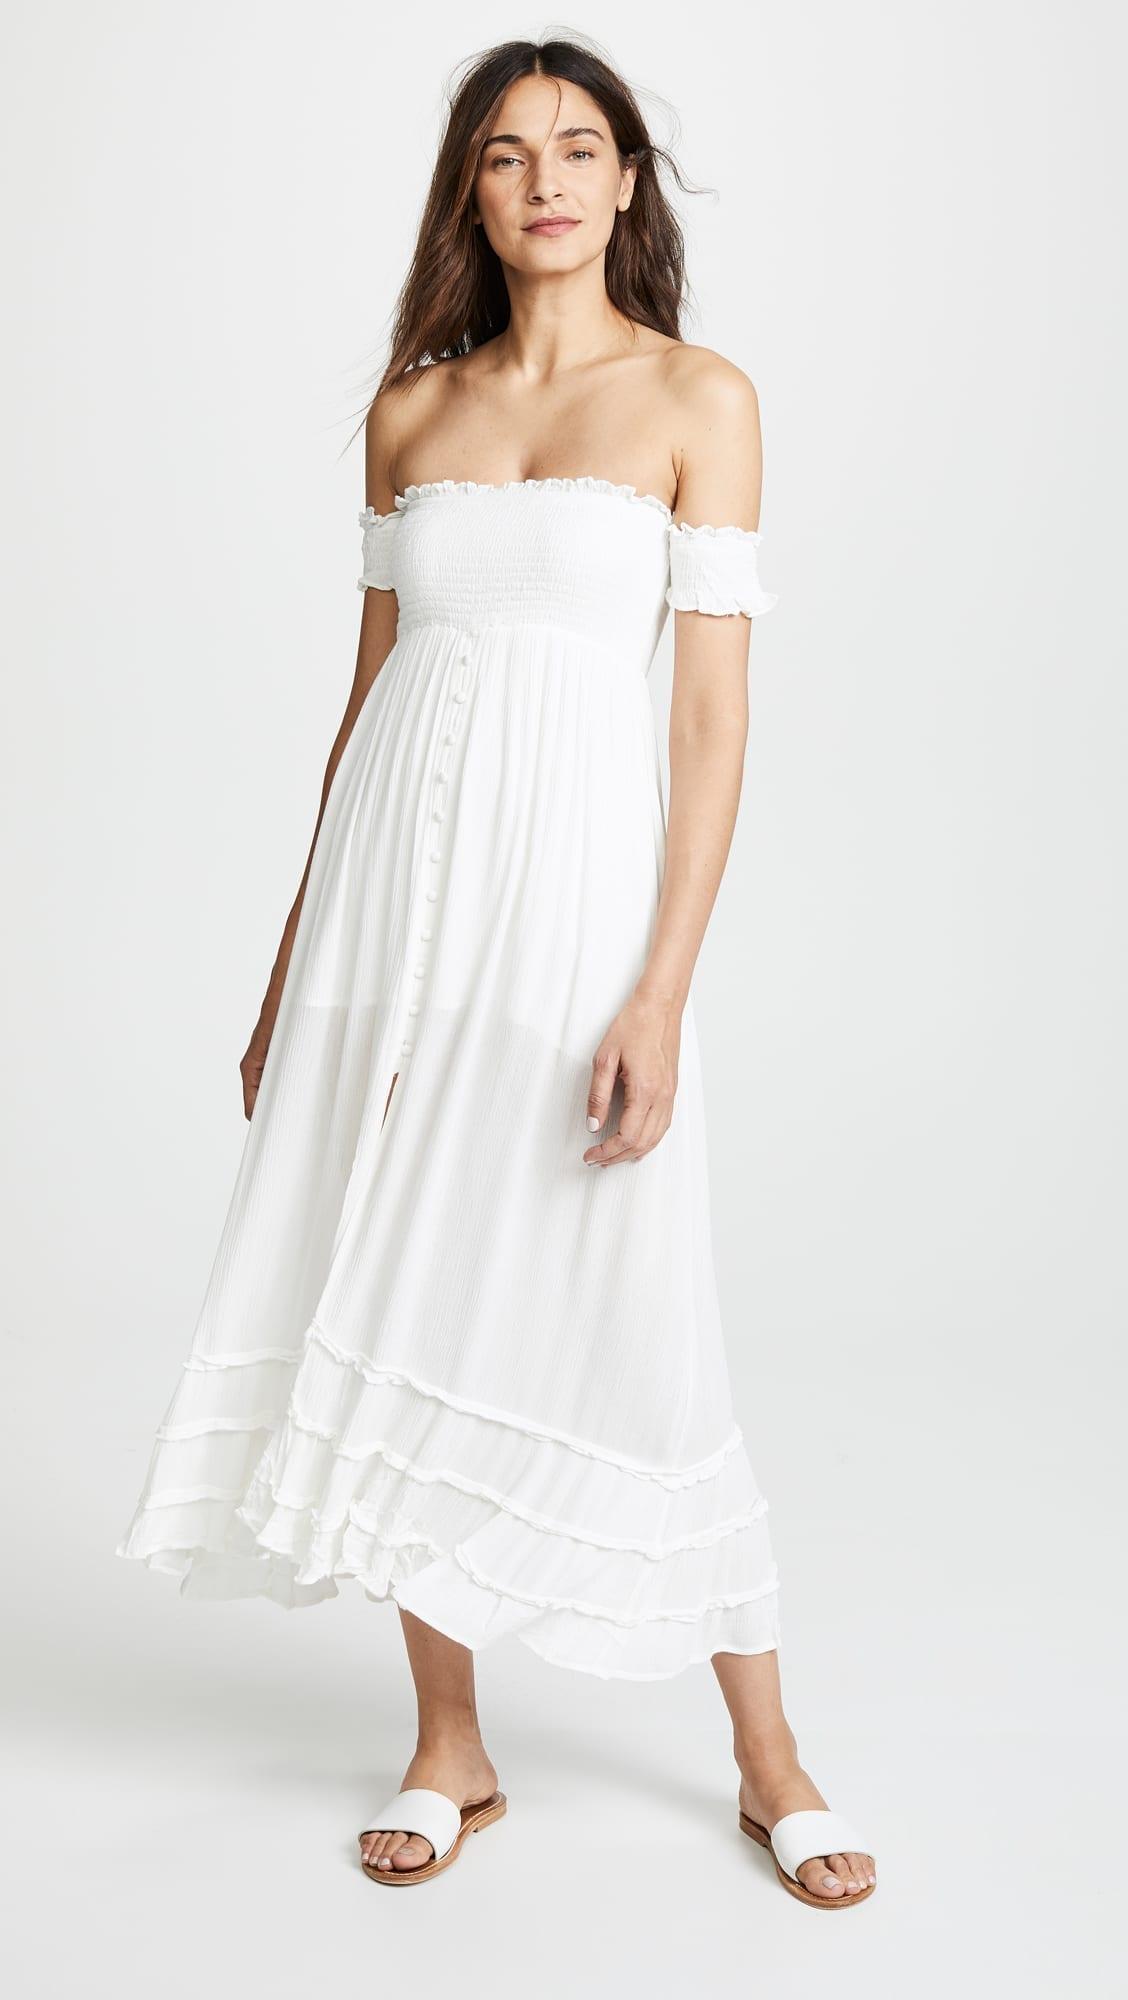 c83965dbb1d7 PILYQ Mishell White Dress - We Select Dresses